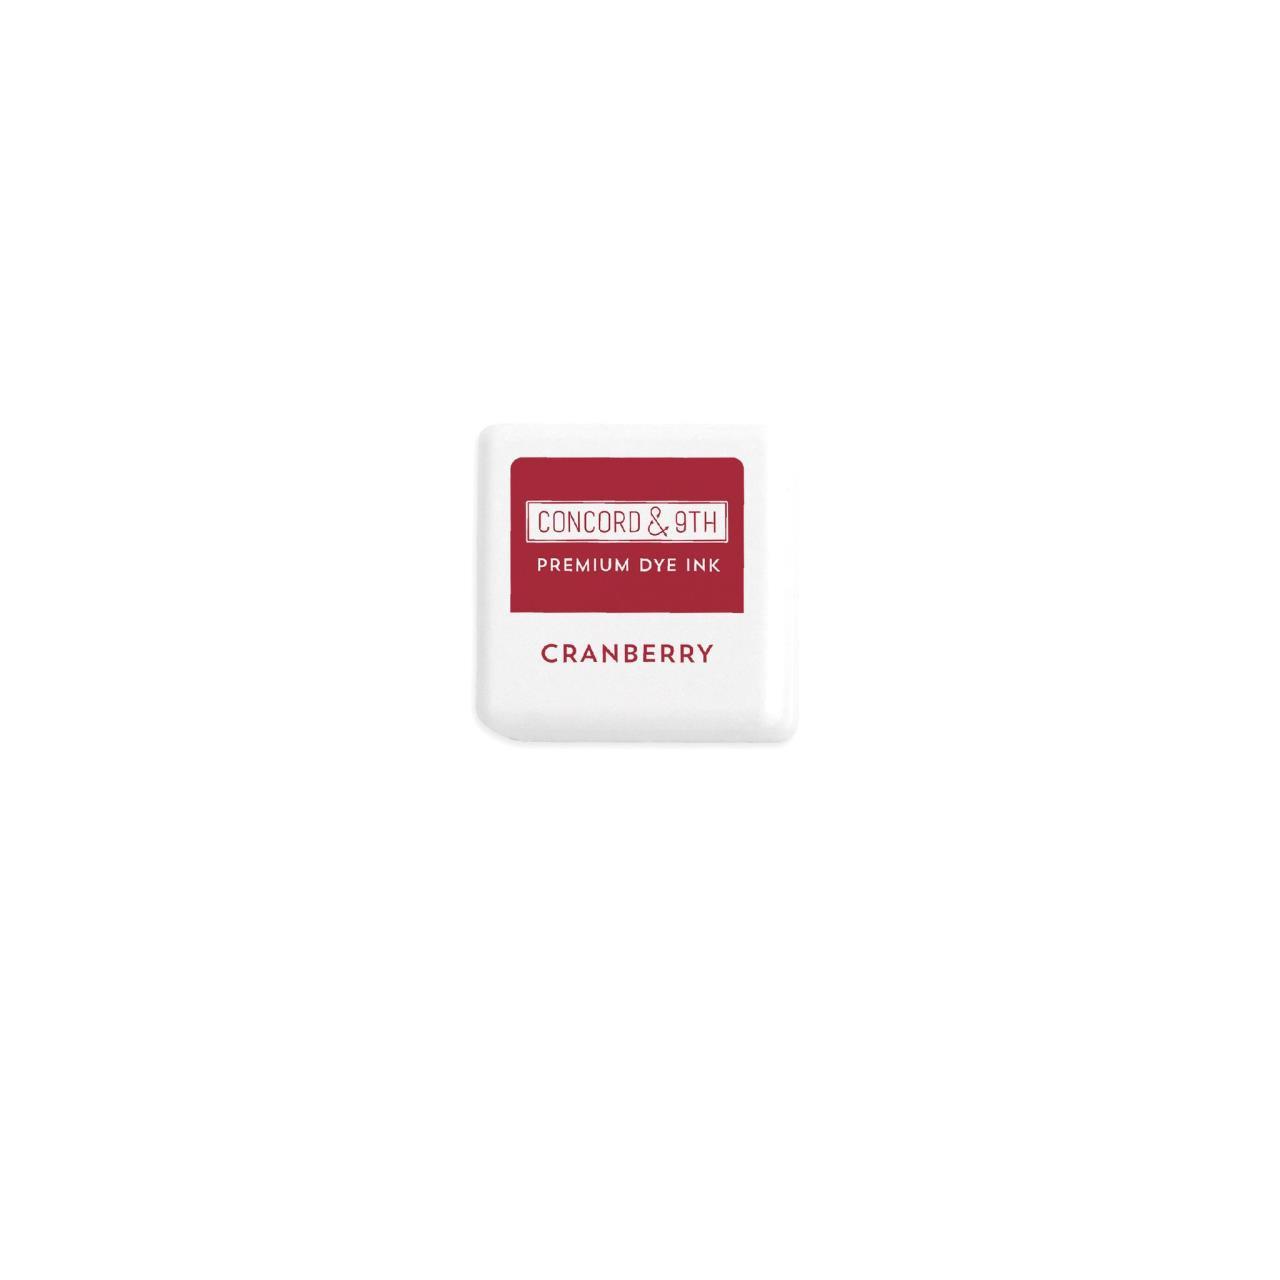 Cranberry, Concord & 9th Premium Dye Ink Cubes - 090222402133